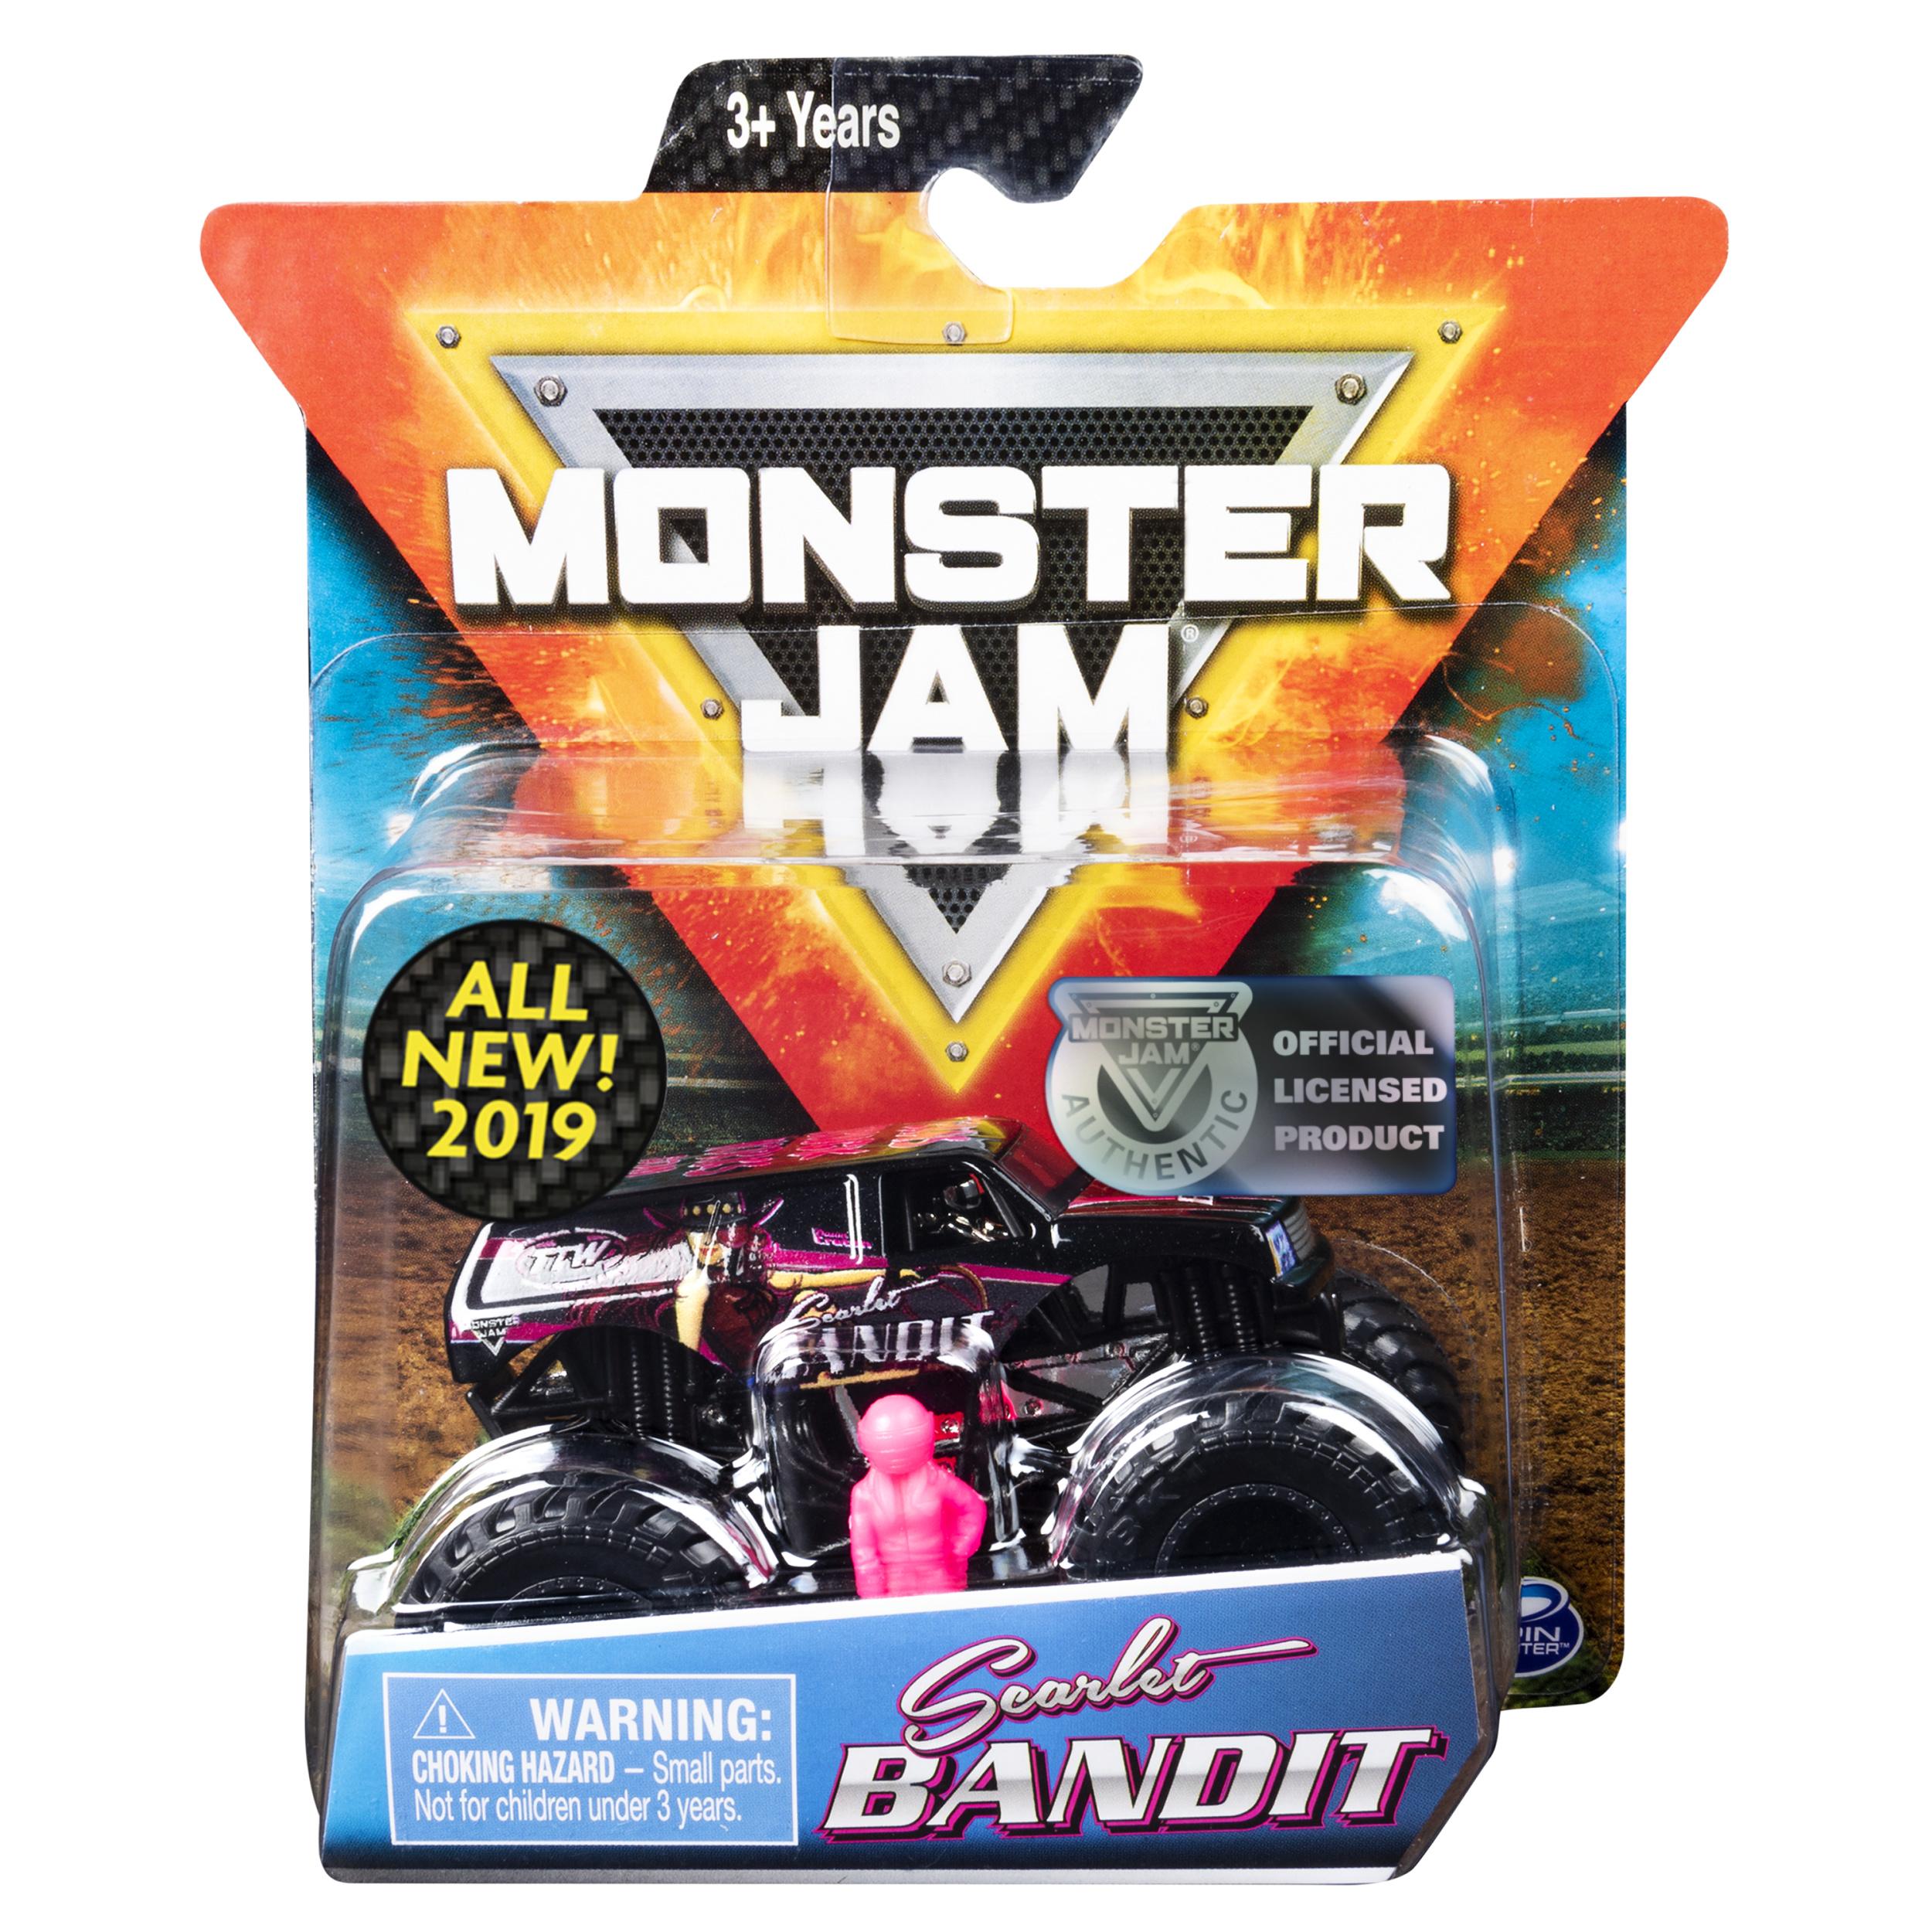 Monster Jam, Official Scarlet Bandit Monster Truck, Die-Cast Vehicle, Danger Divas Series, 1:64 Scale